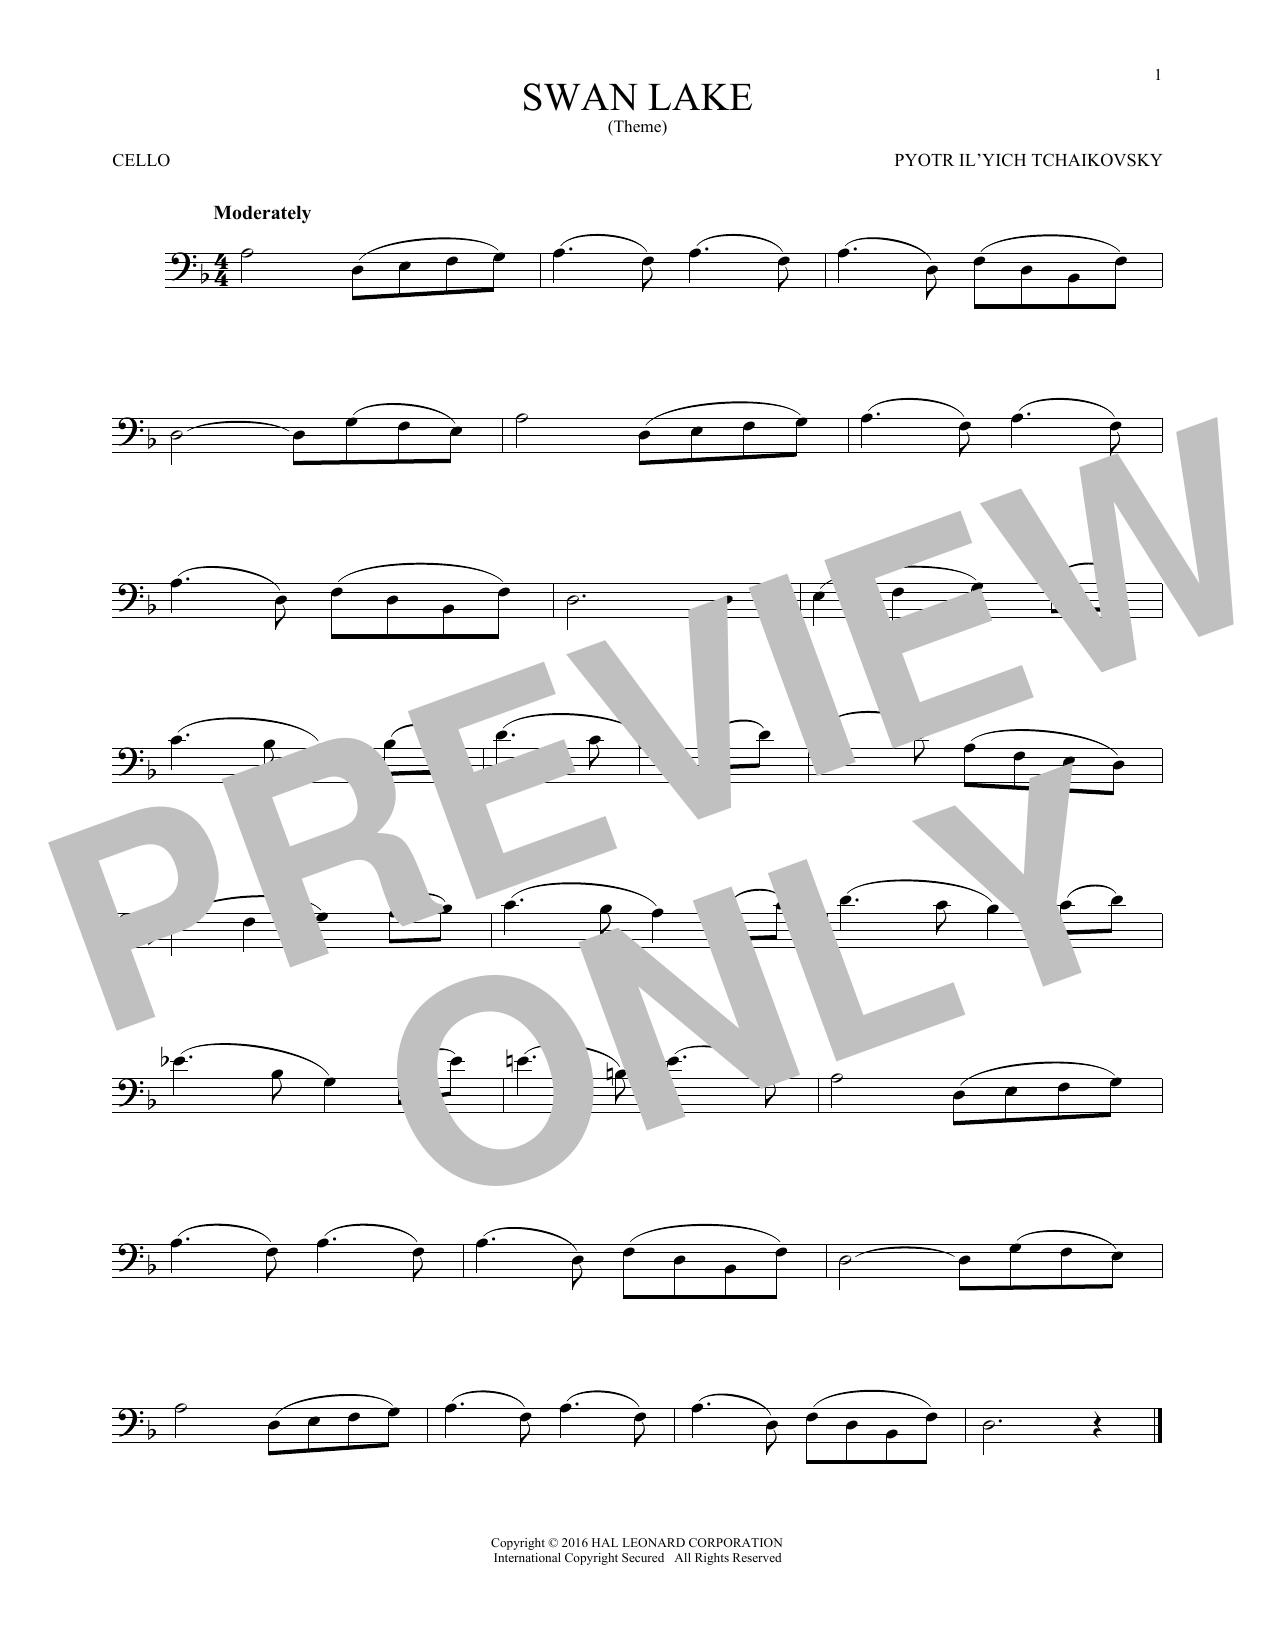 Theme From Swan Lake (Cello Solo)